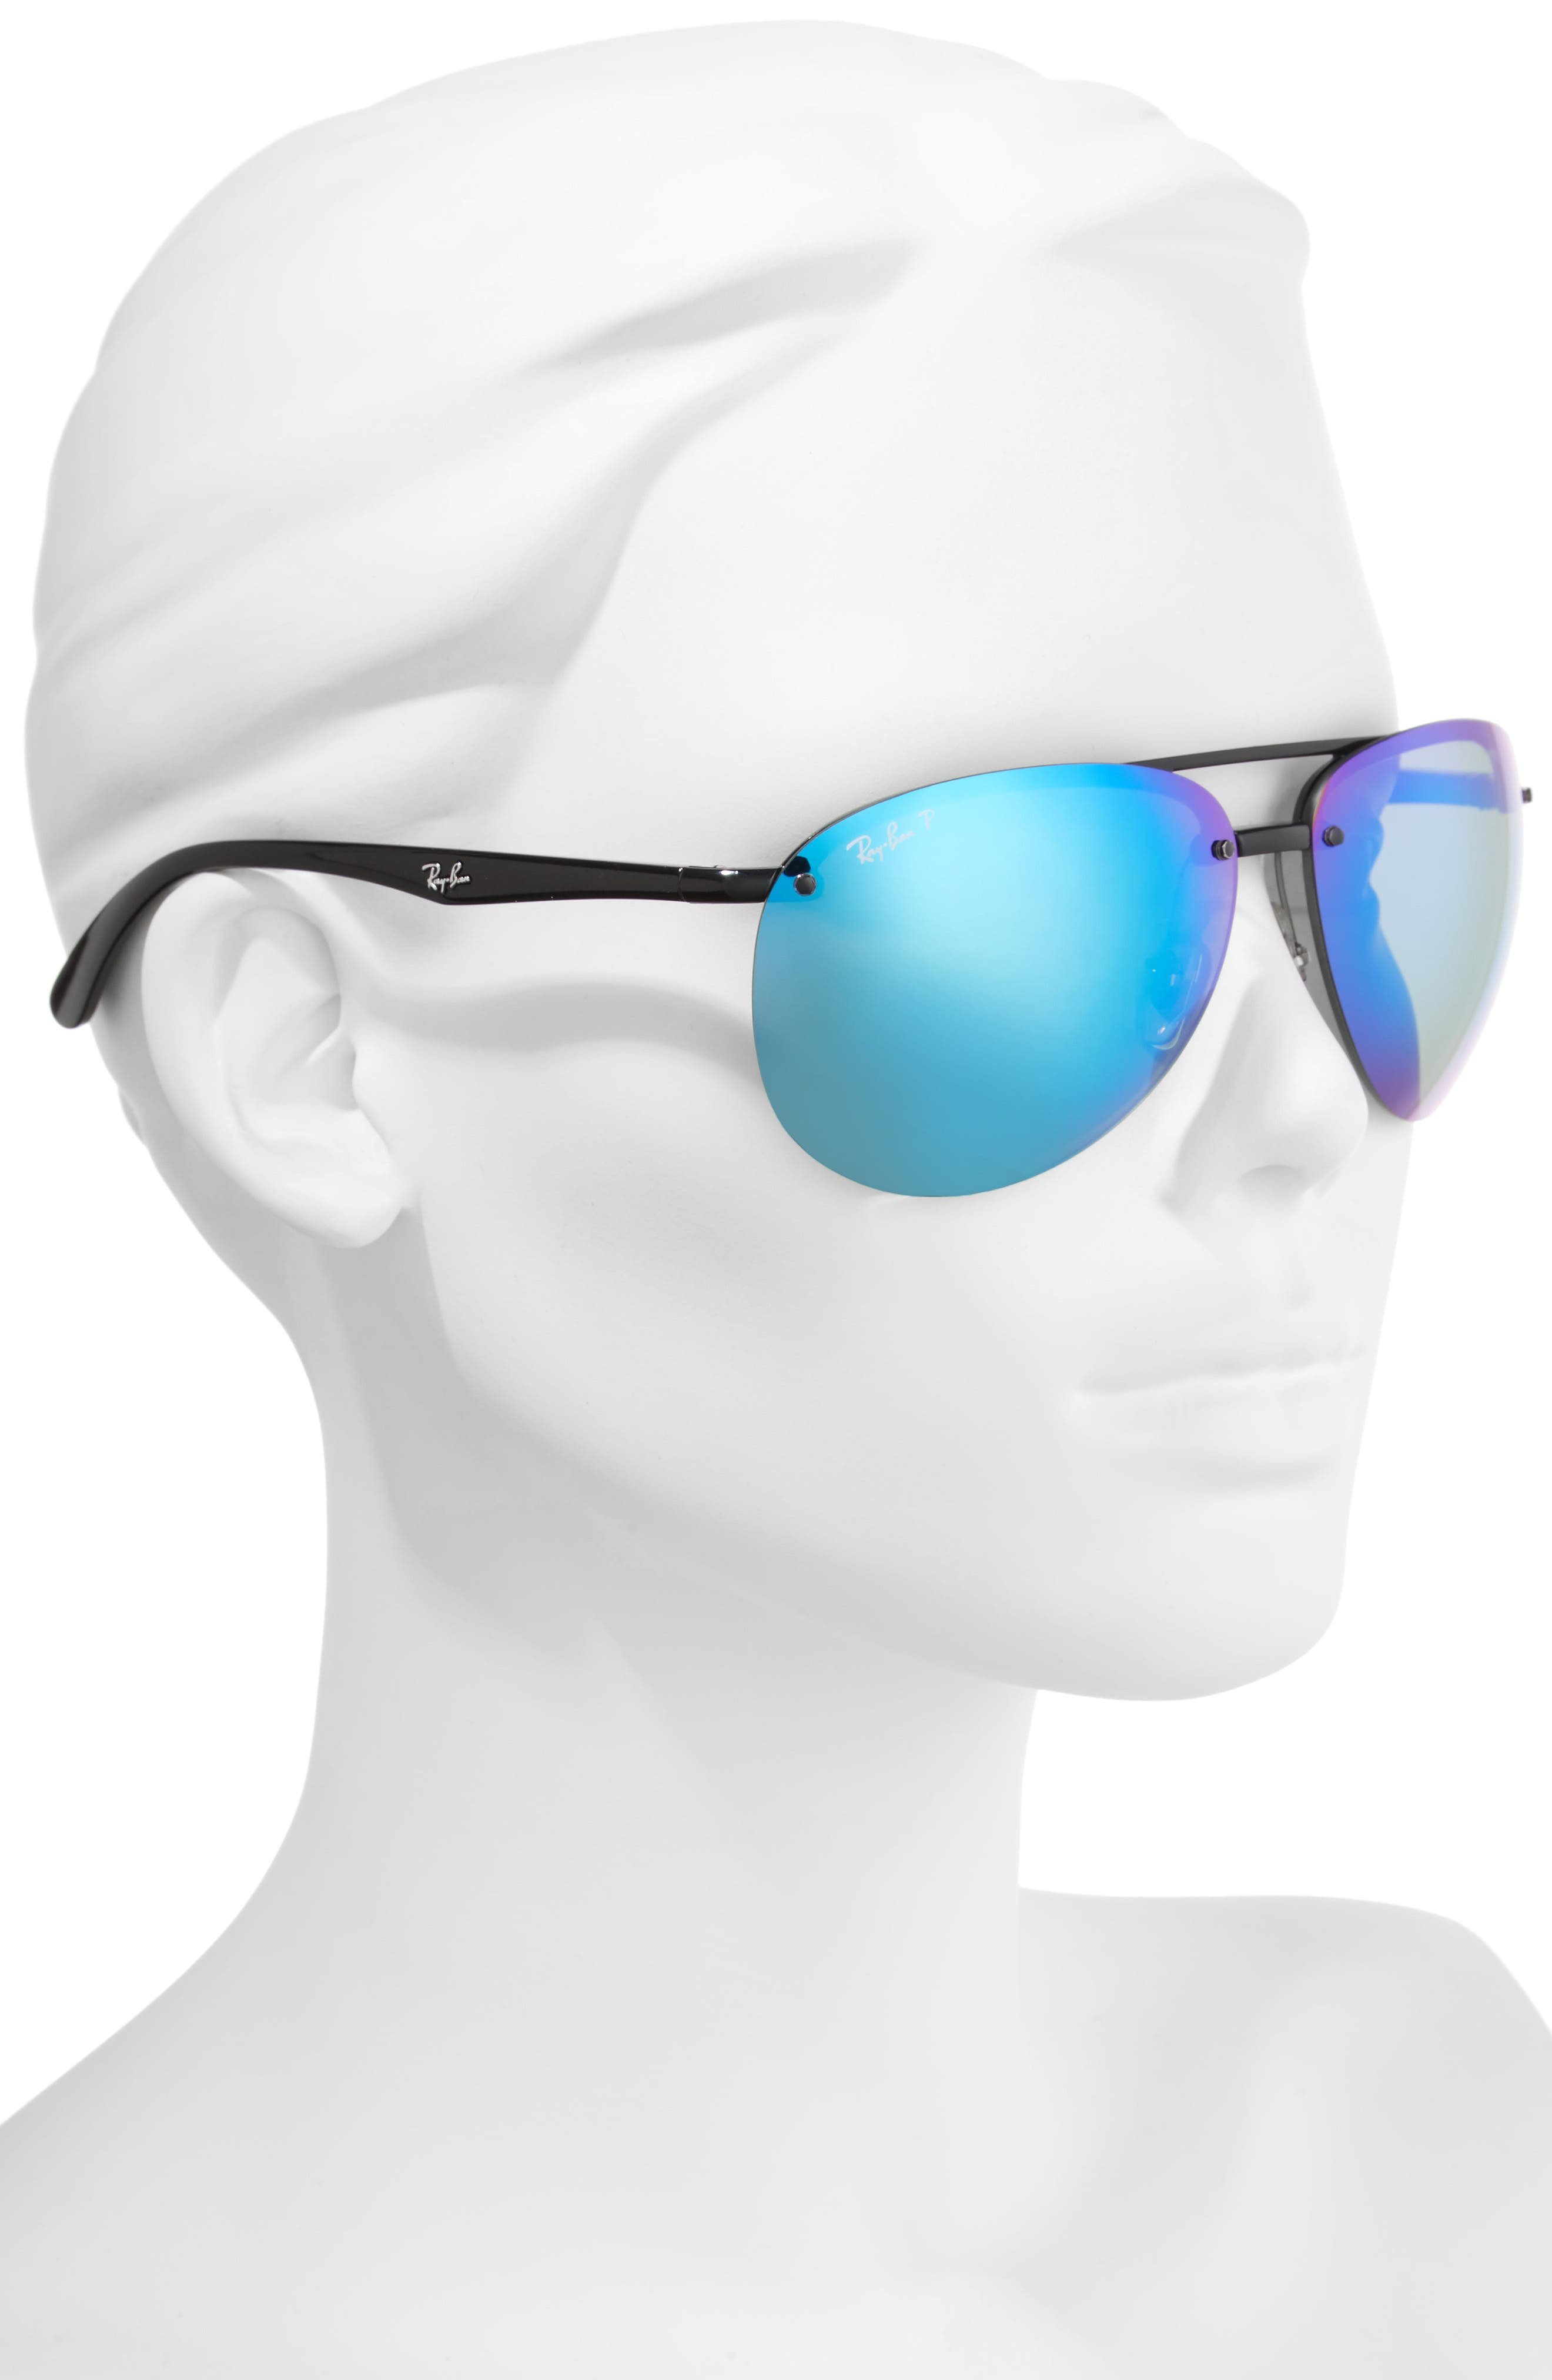 64mm Oversized Polarized Mirrored Rimless Aviator Sunglasses,                             Alternate thumbnail 3, color,                             Black